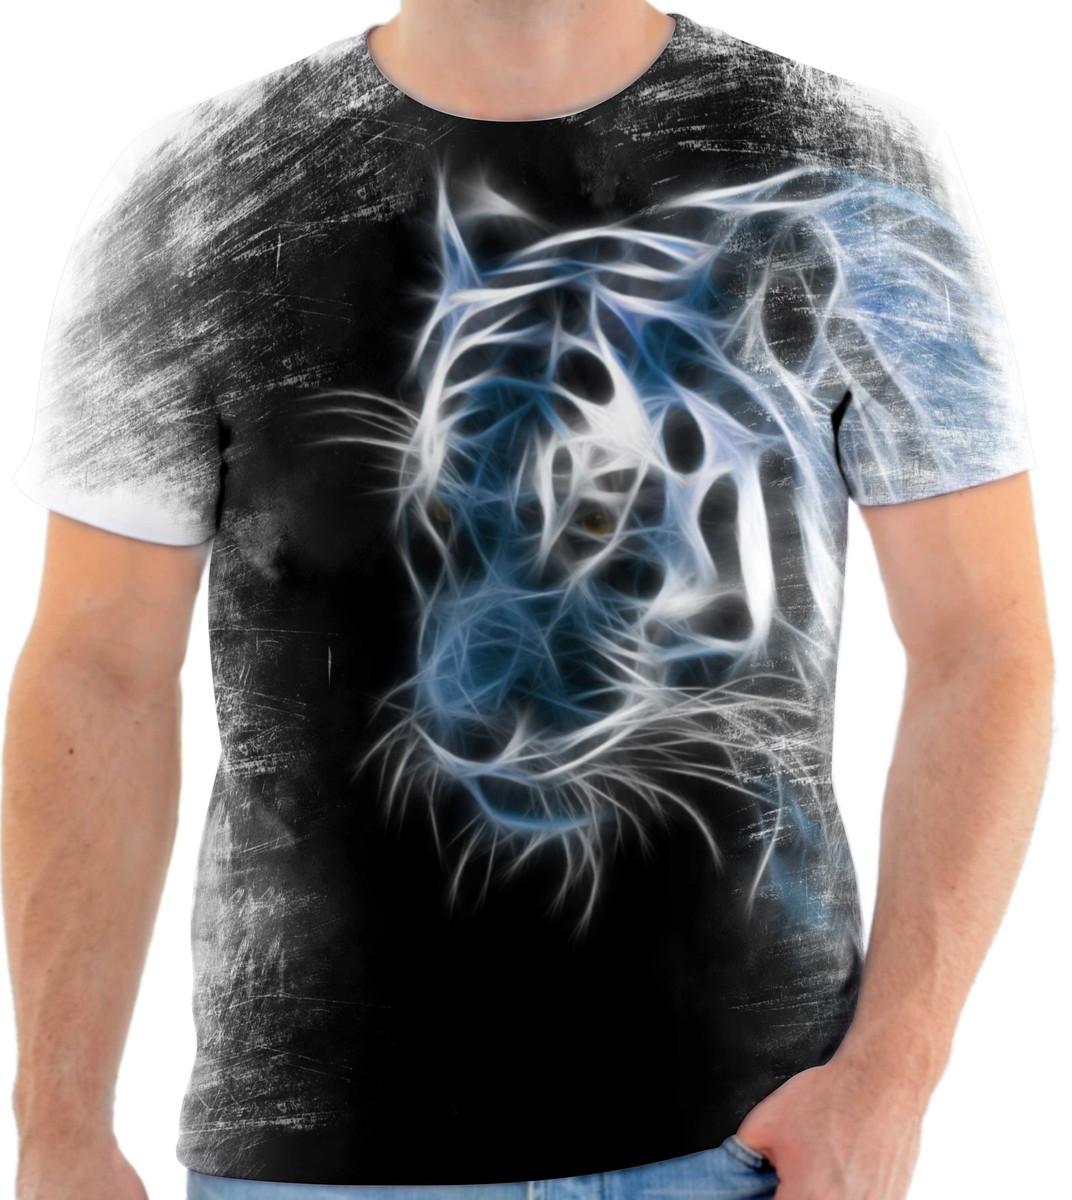 bc26103c45745 Camisa Camiseta Personalizada Animal Tigre Animal 01 no Elo7 ...